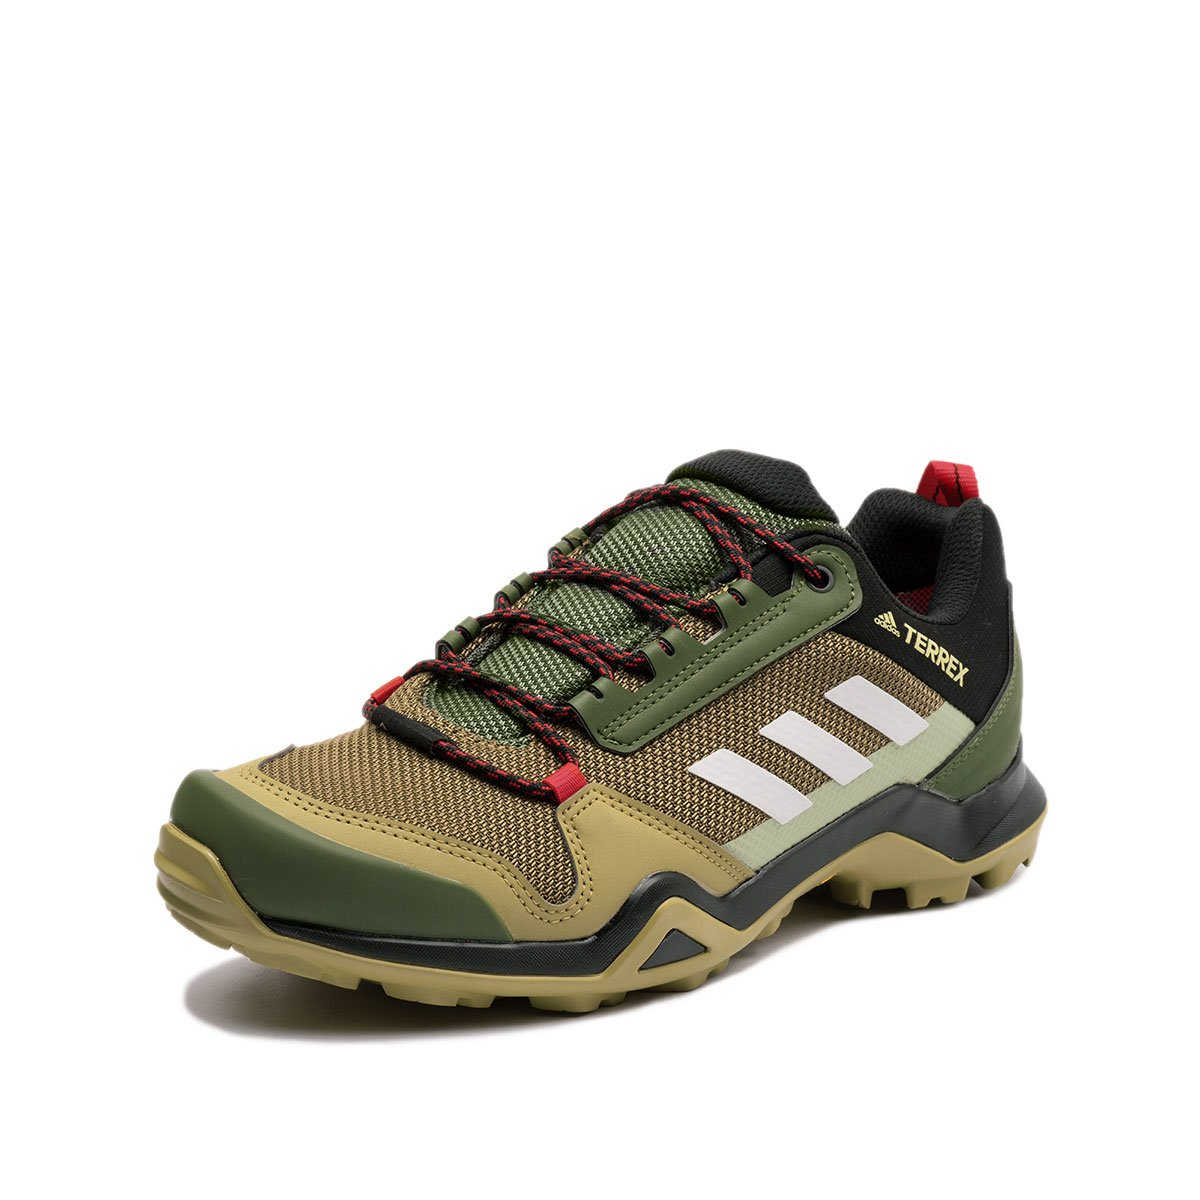 Adidas Terrex AX3 Gore-Tex